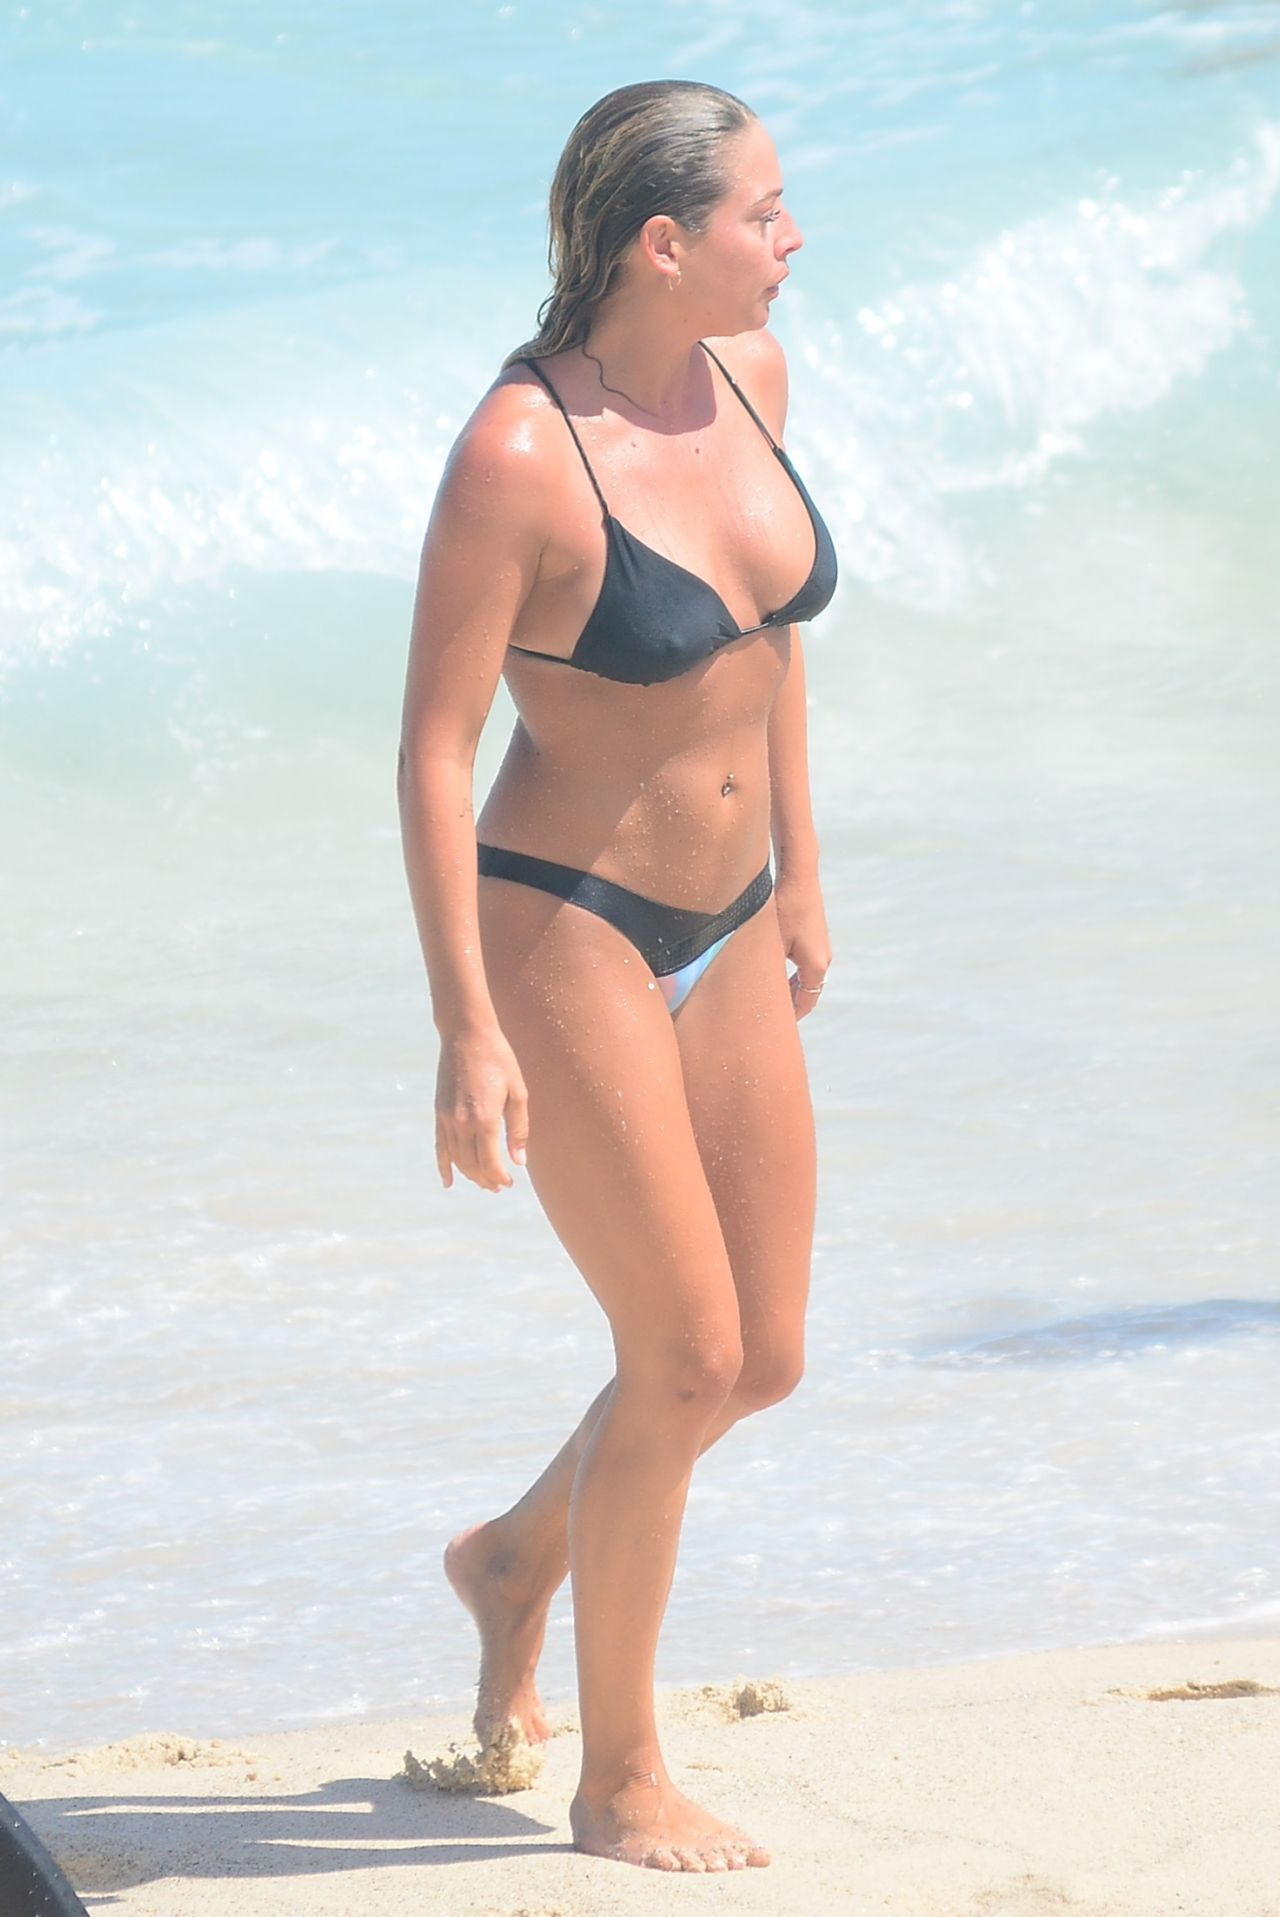 Lisa Clarke in Black Bikini at Tamarama Beach in Sydney Pic 29 of 35